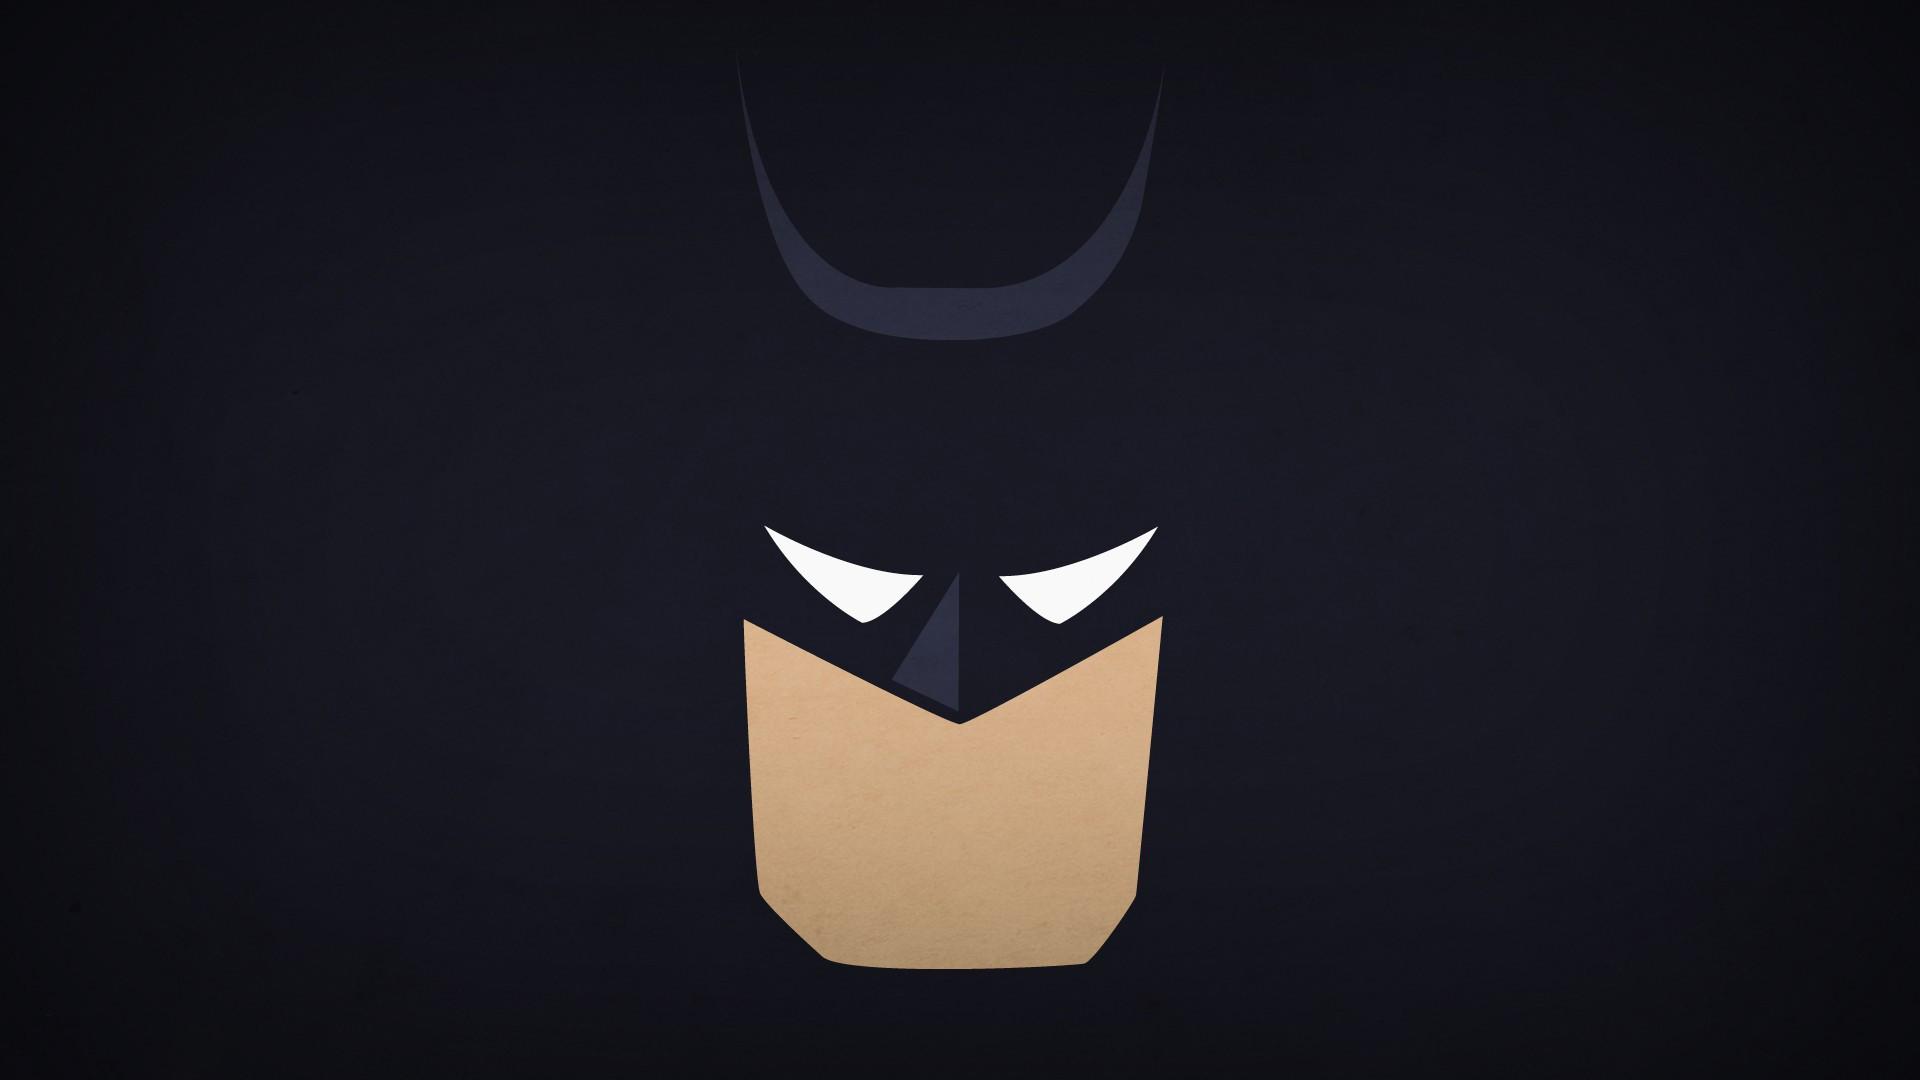 Batman HD Wallpapers for Desktop (3)